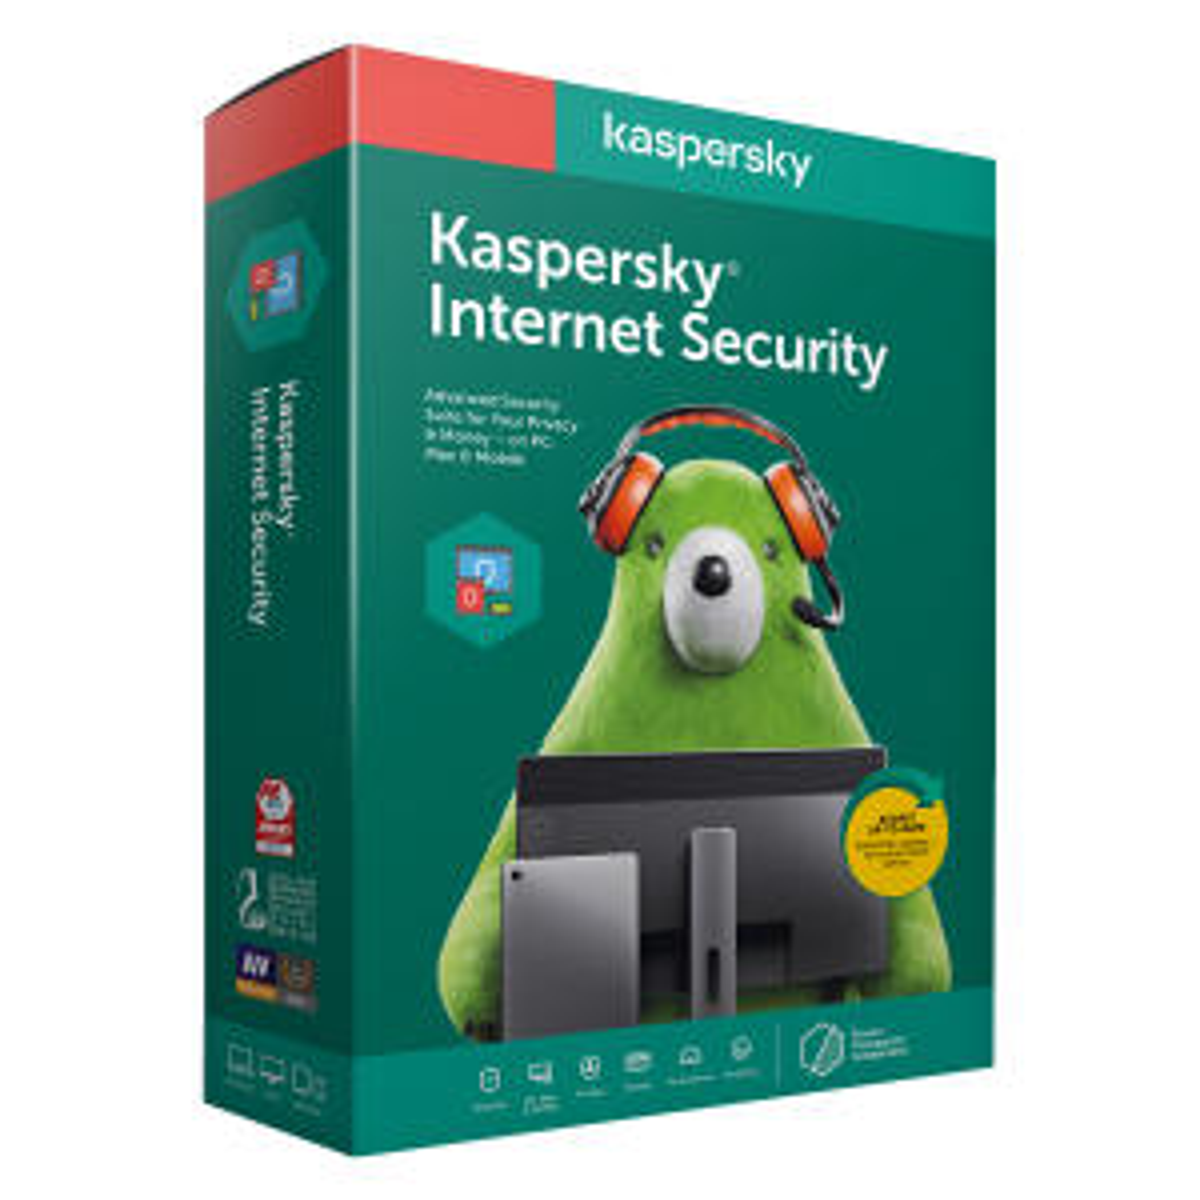 نرم افزار آنتی ویروس کسپرسکی لب نسخه اینترنت سکیوریتی 2020 دو کاربره 1 ساله